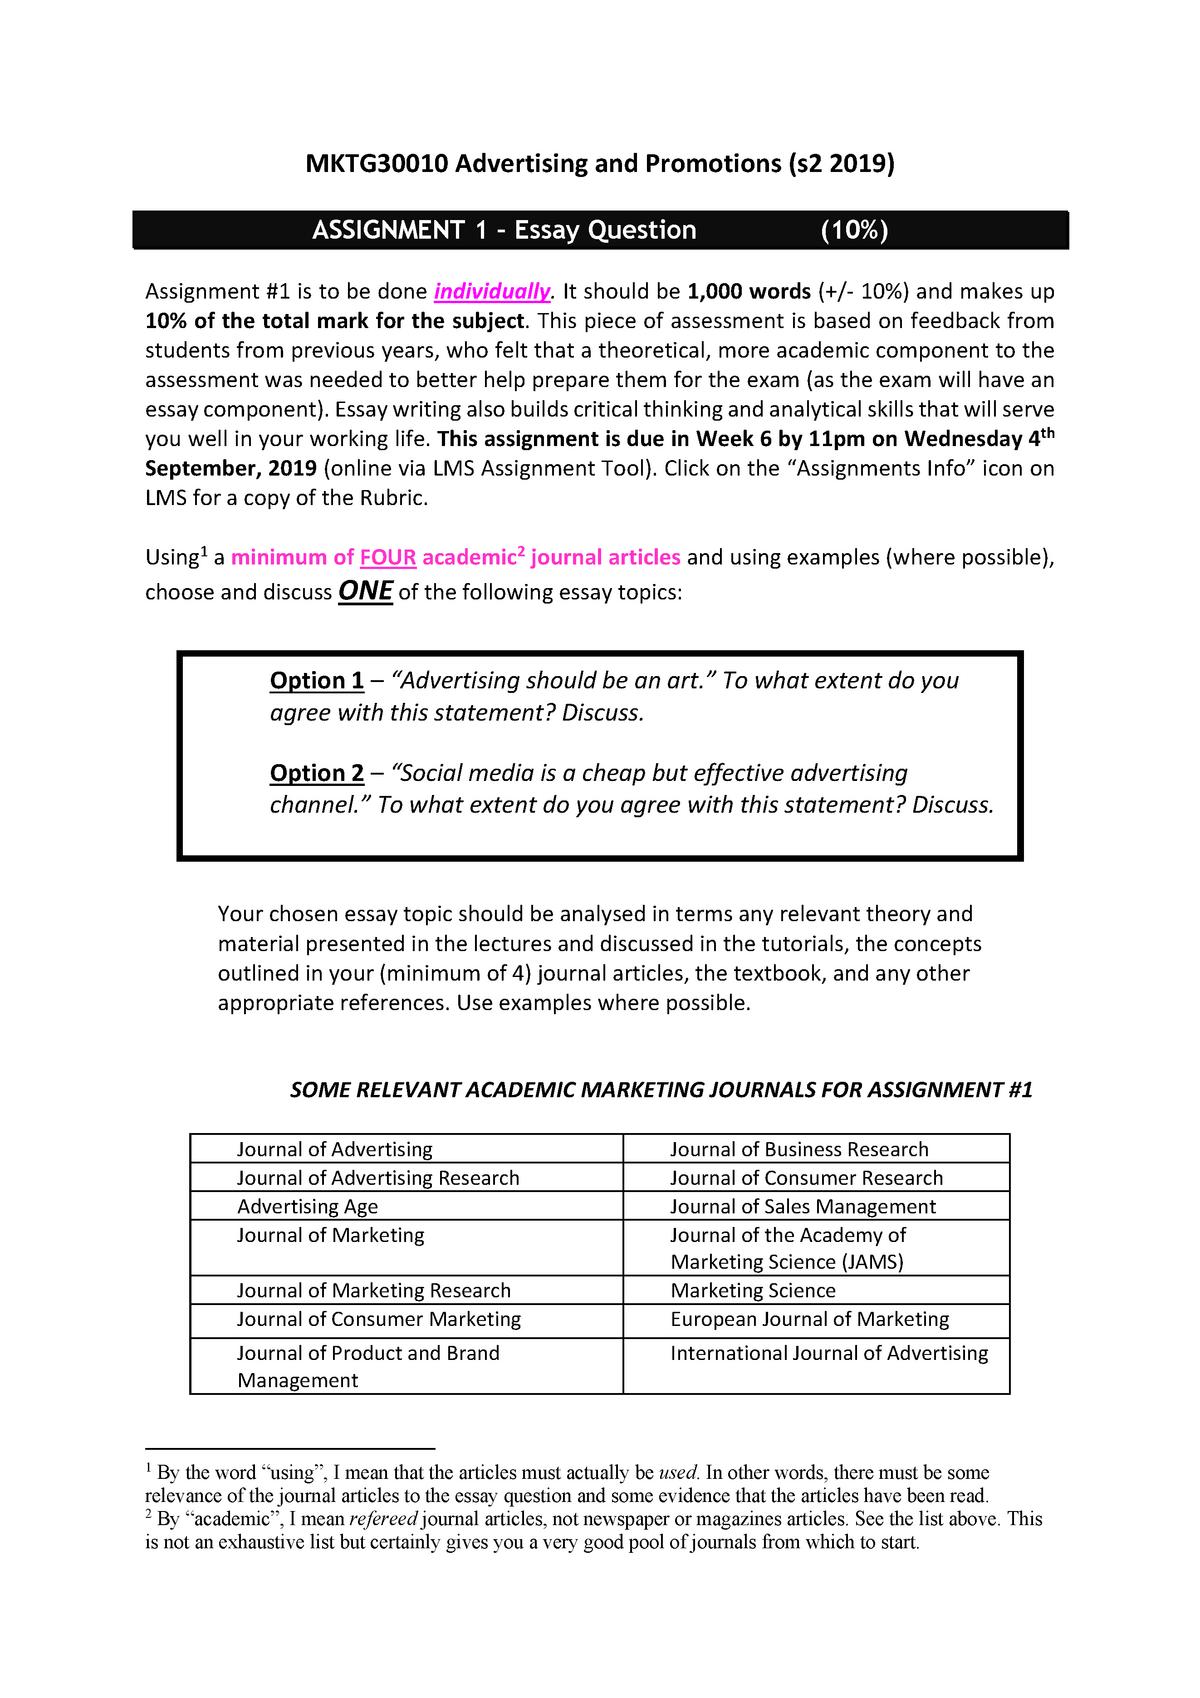 Welfare of my society essay writing